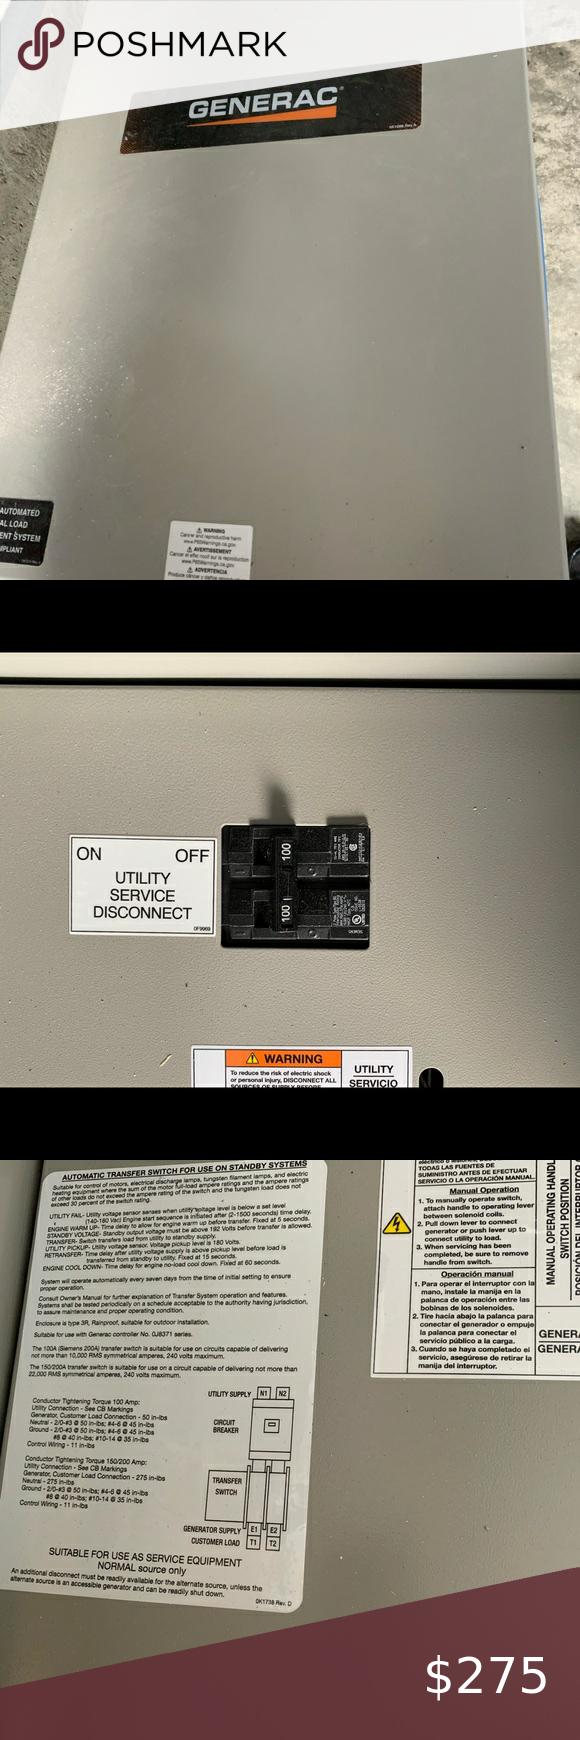 Generac 100a 1o 120 240v Transfer Switch Generac Rxsw100a3 100a 1o 120 240v Service Rated Nema 3r Automatic Trans In 2020 Transfer Switch Switch Transfer